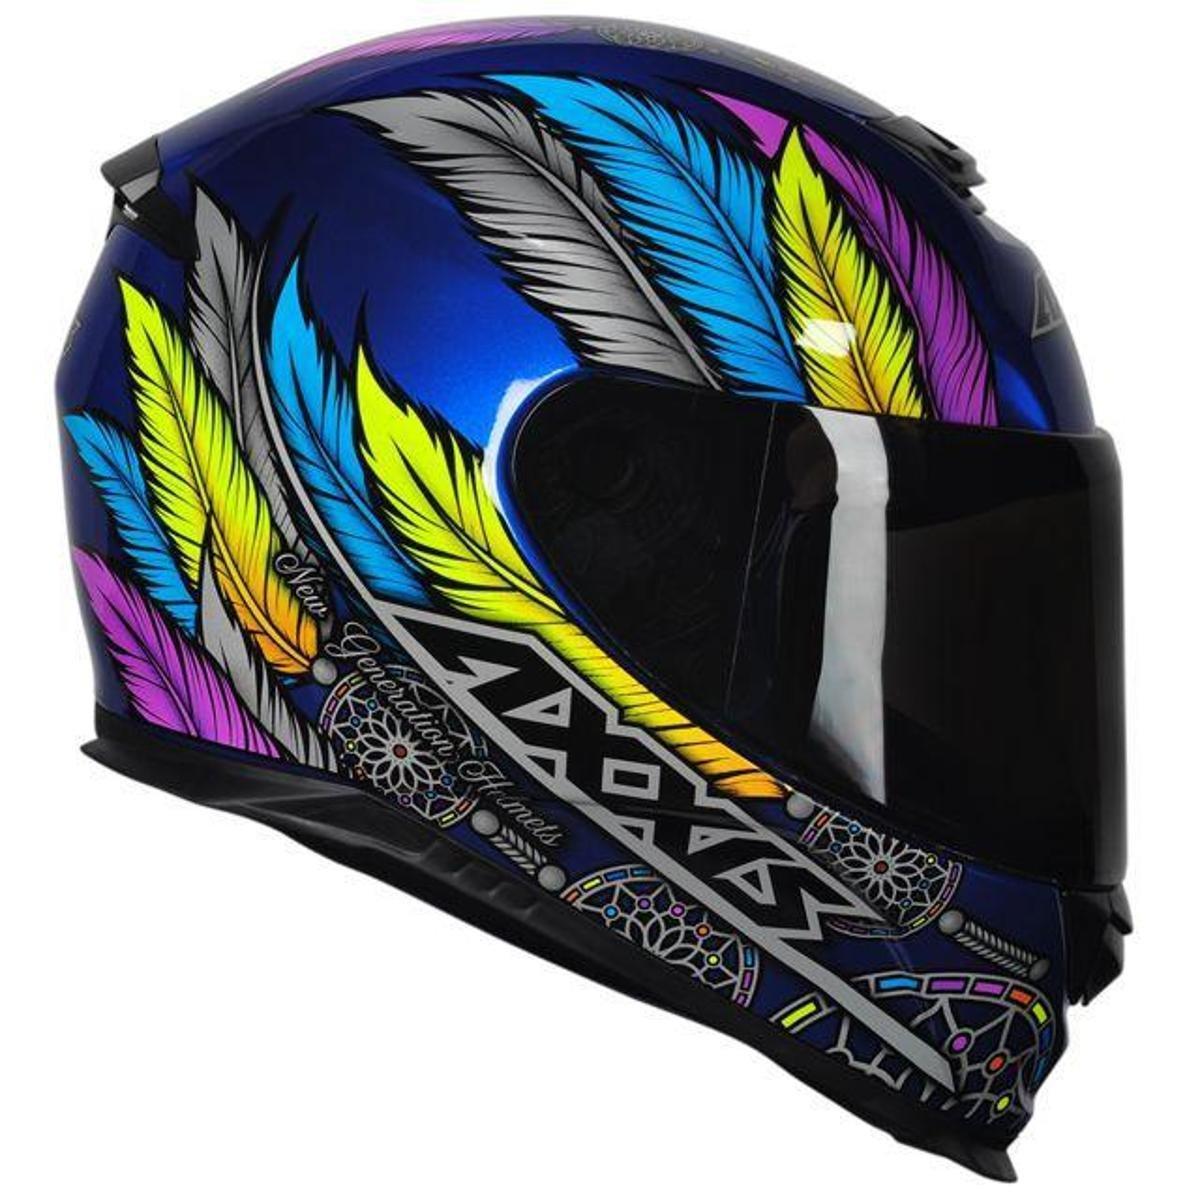 Capacete Axxis Eagle Dreams Gloss - Azul